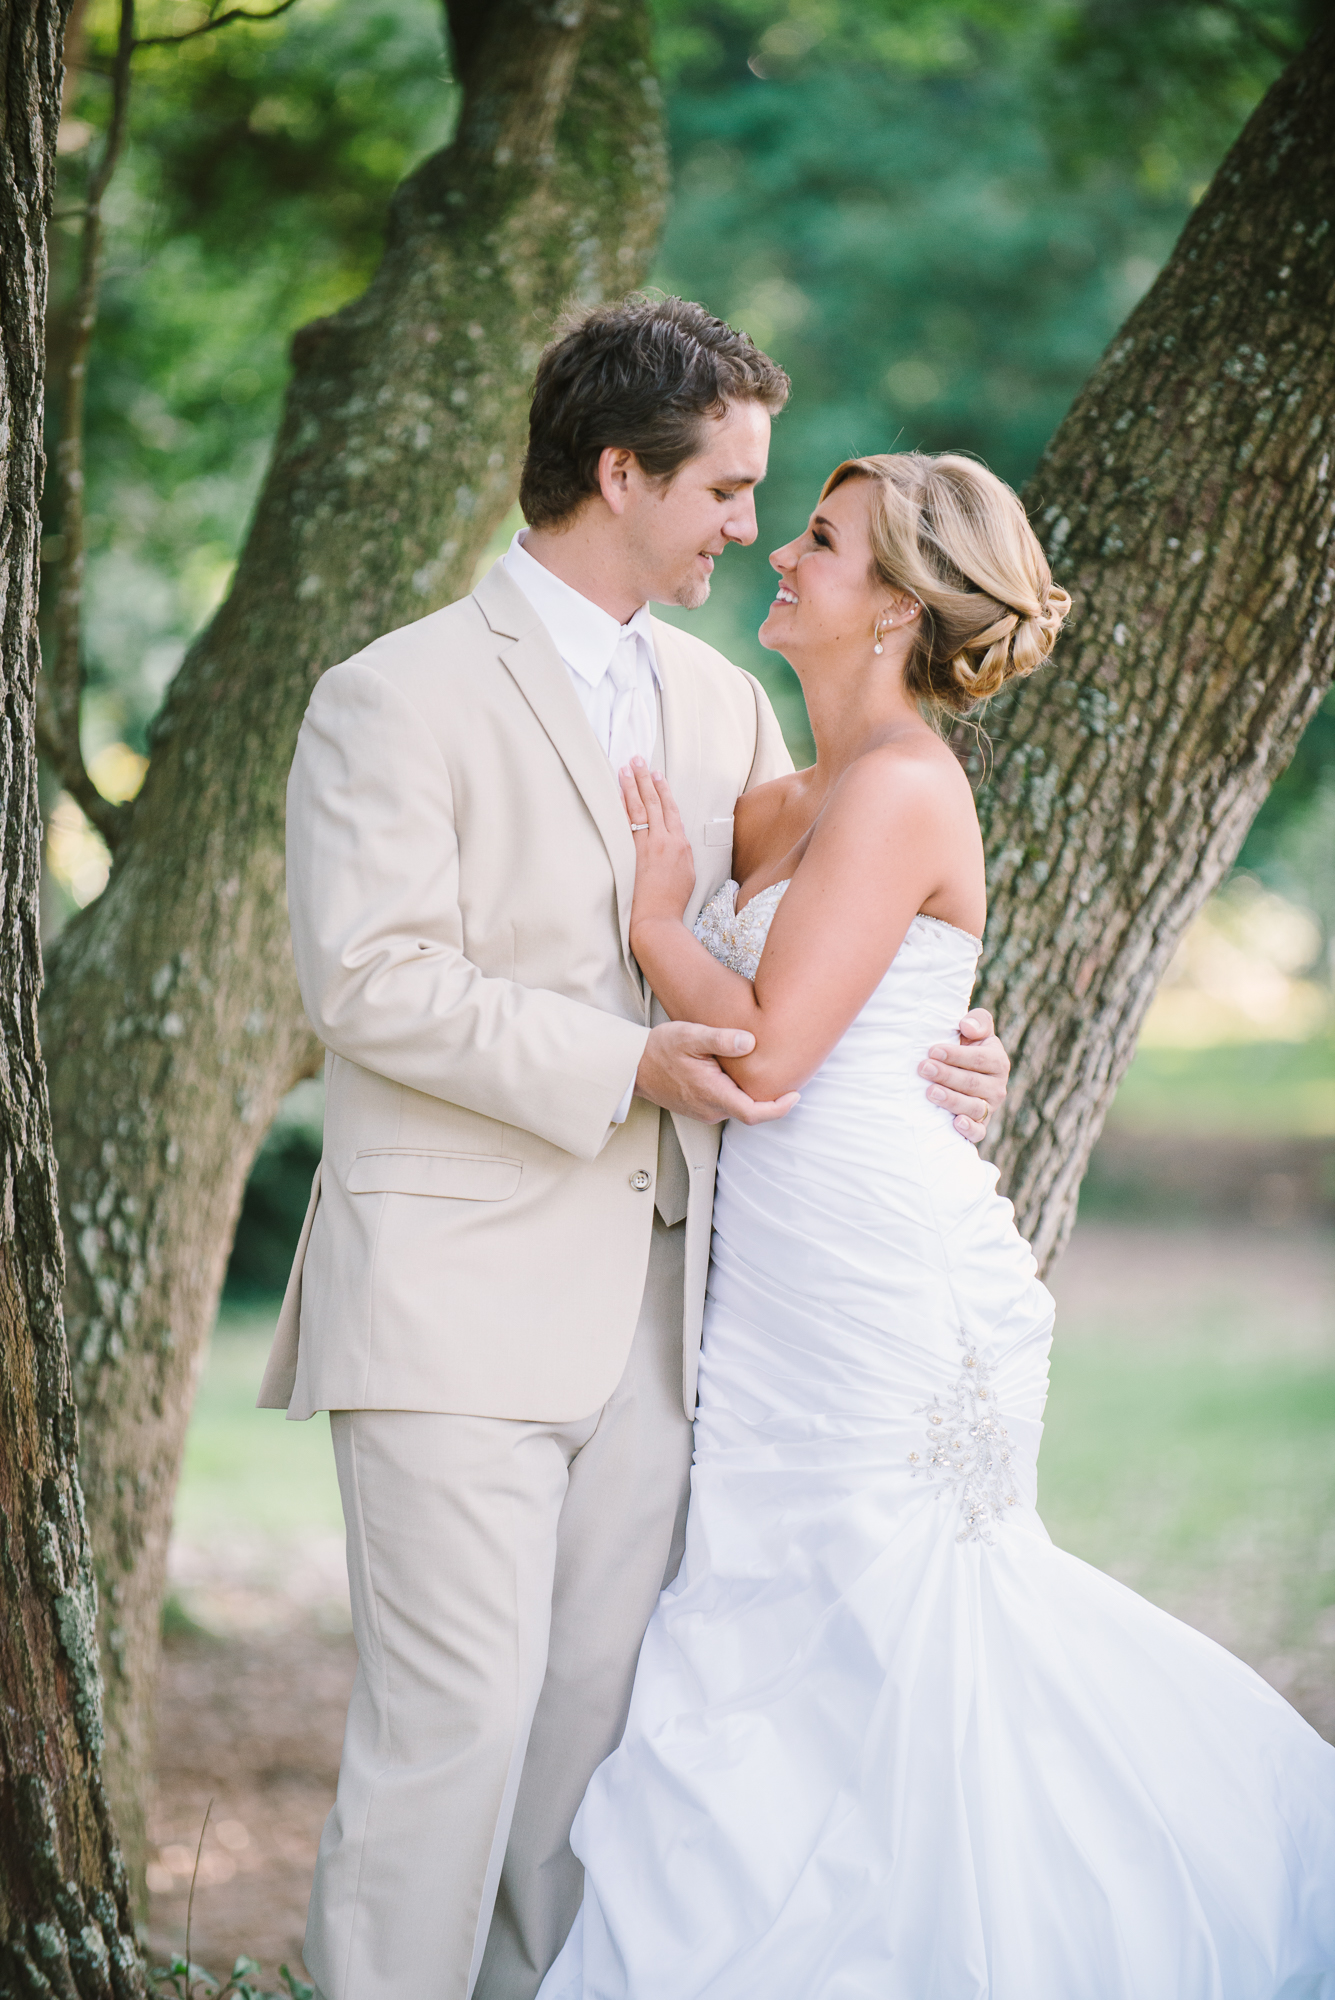 Heather-Chris-wedding-blog-28.jpg